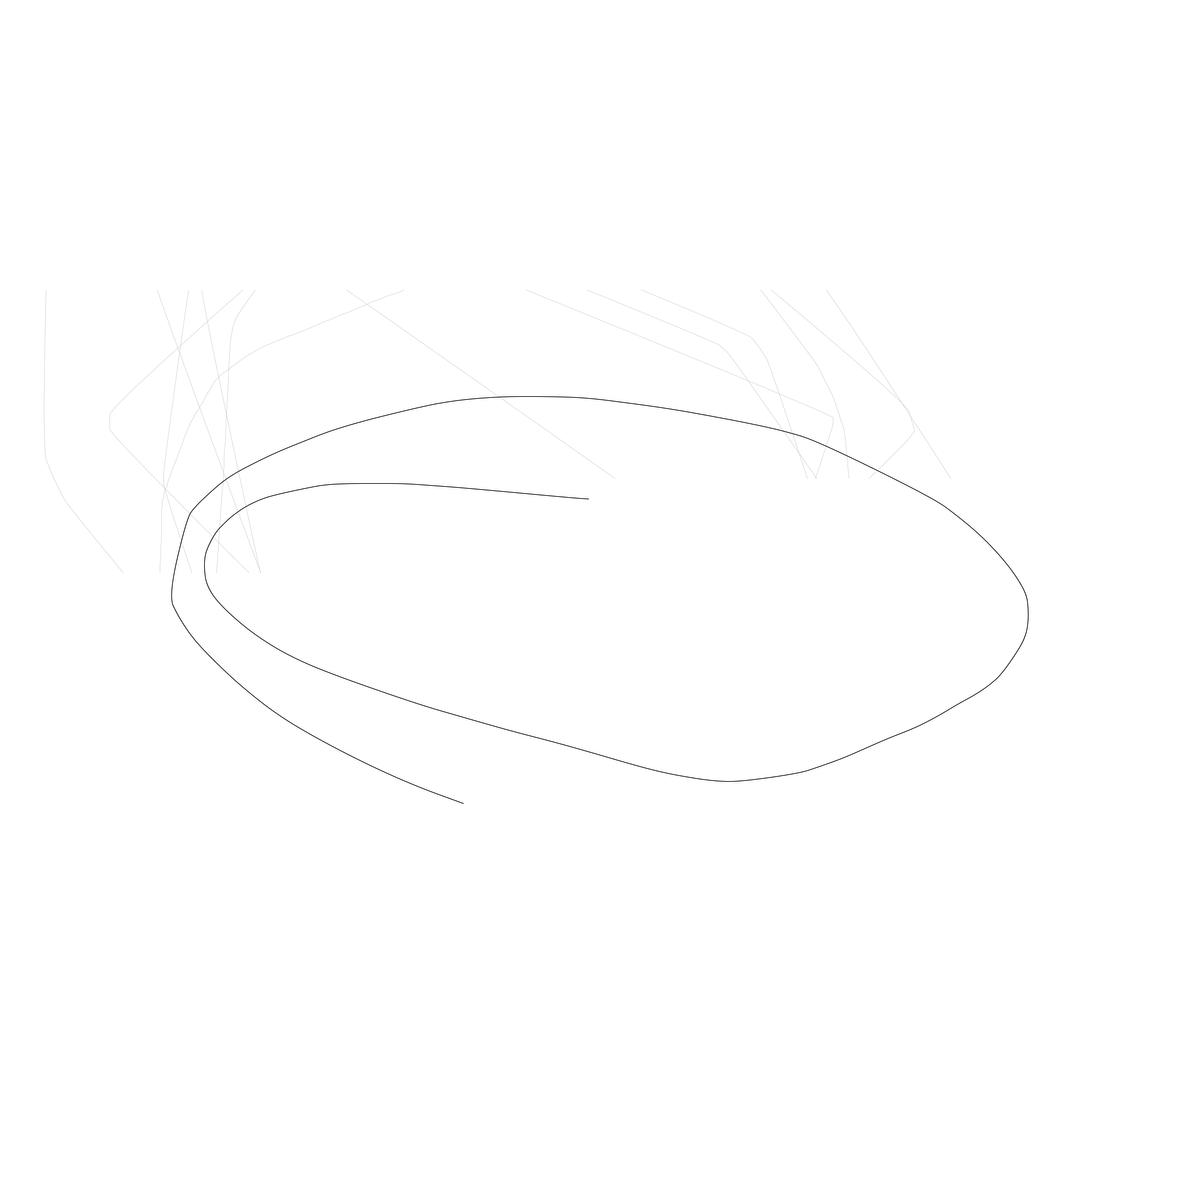 BAAAM drawing#8954 lat:52.4885520935058600lng: 13.4254016876220700